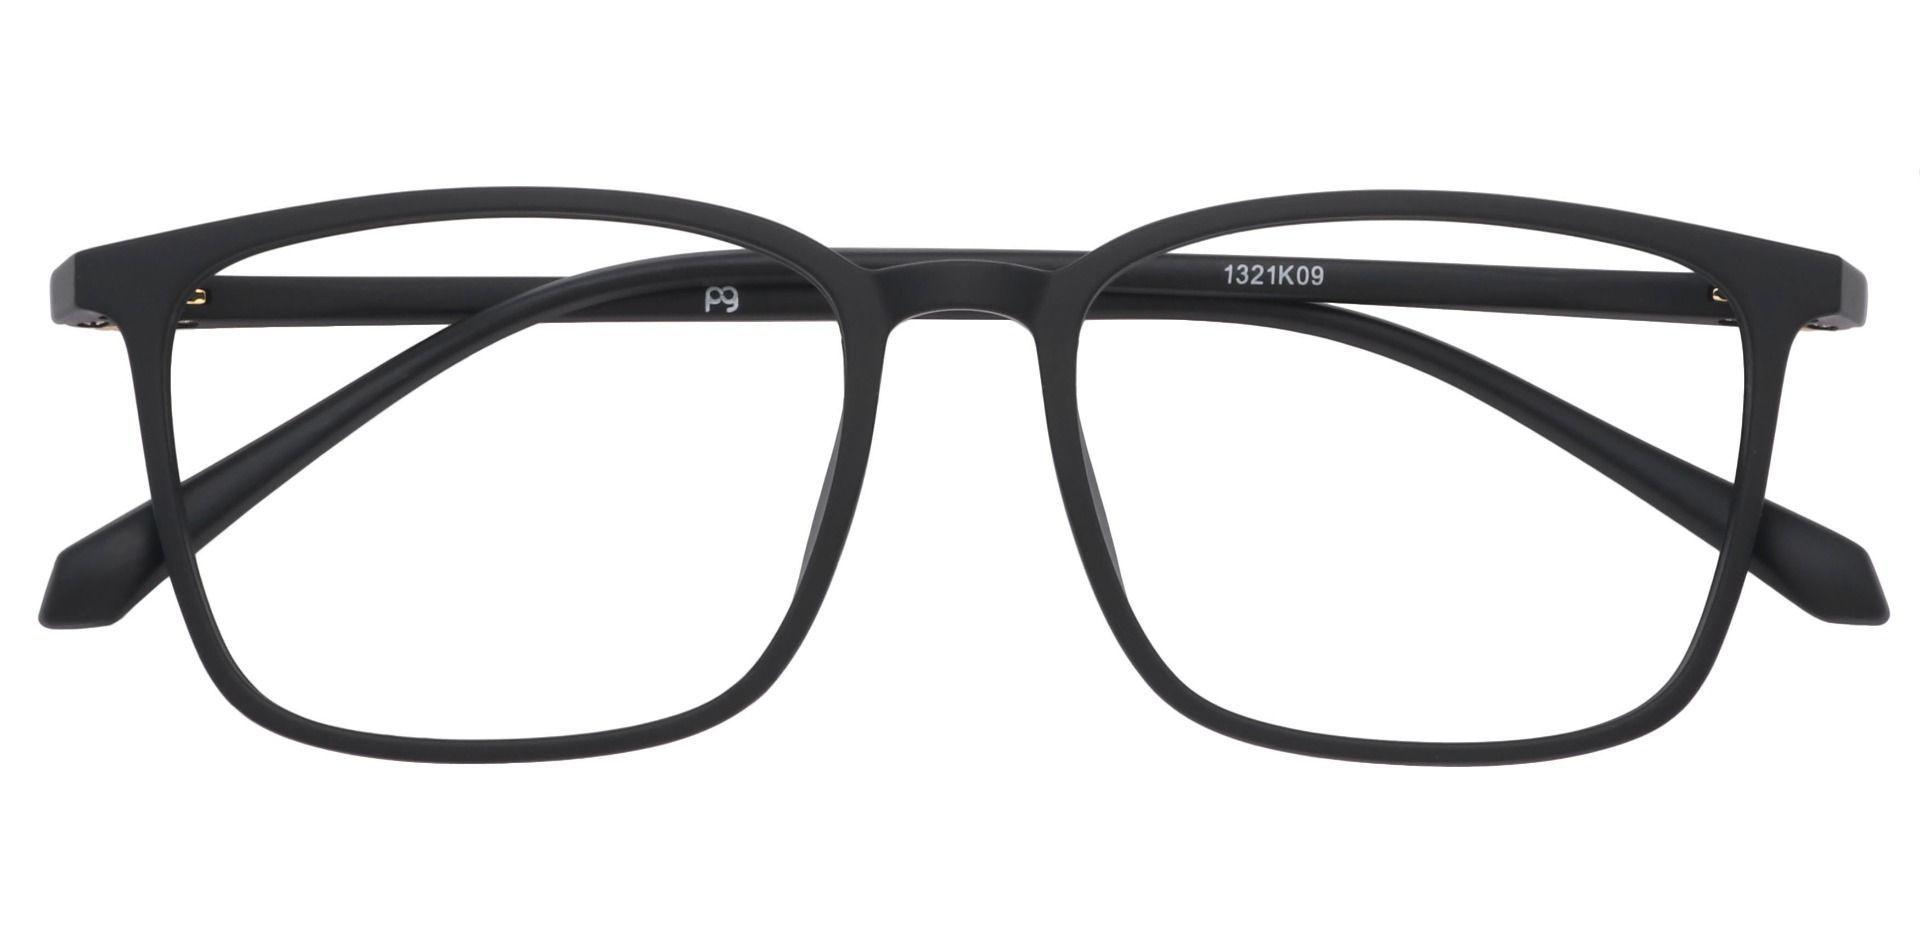 Hayworth Rectangle Progressive Glasses - Black